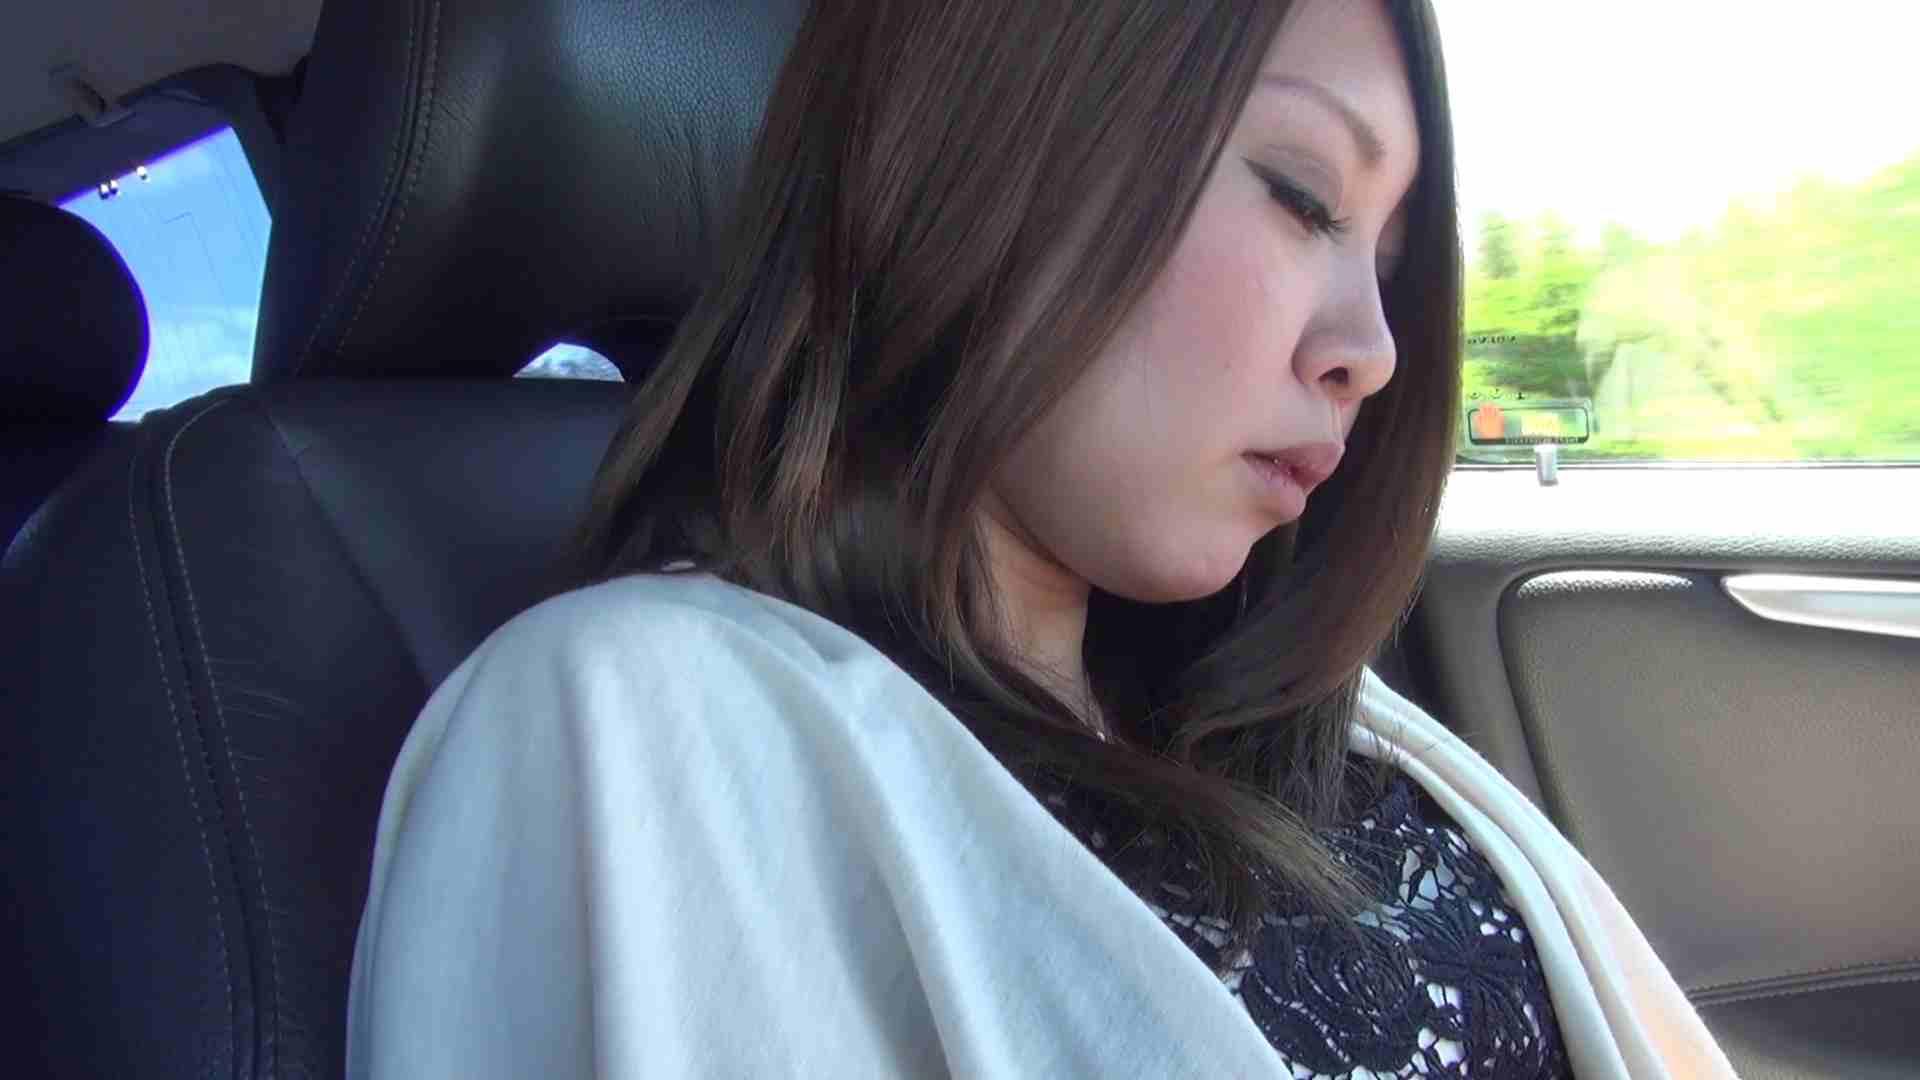 episode6 ドライブ中に・・・妻に強せいオナニー 淫乱  84連発 32